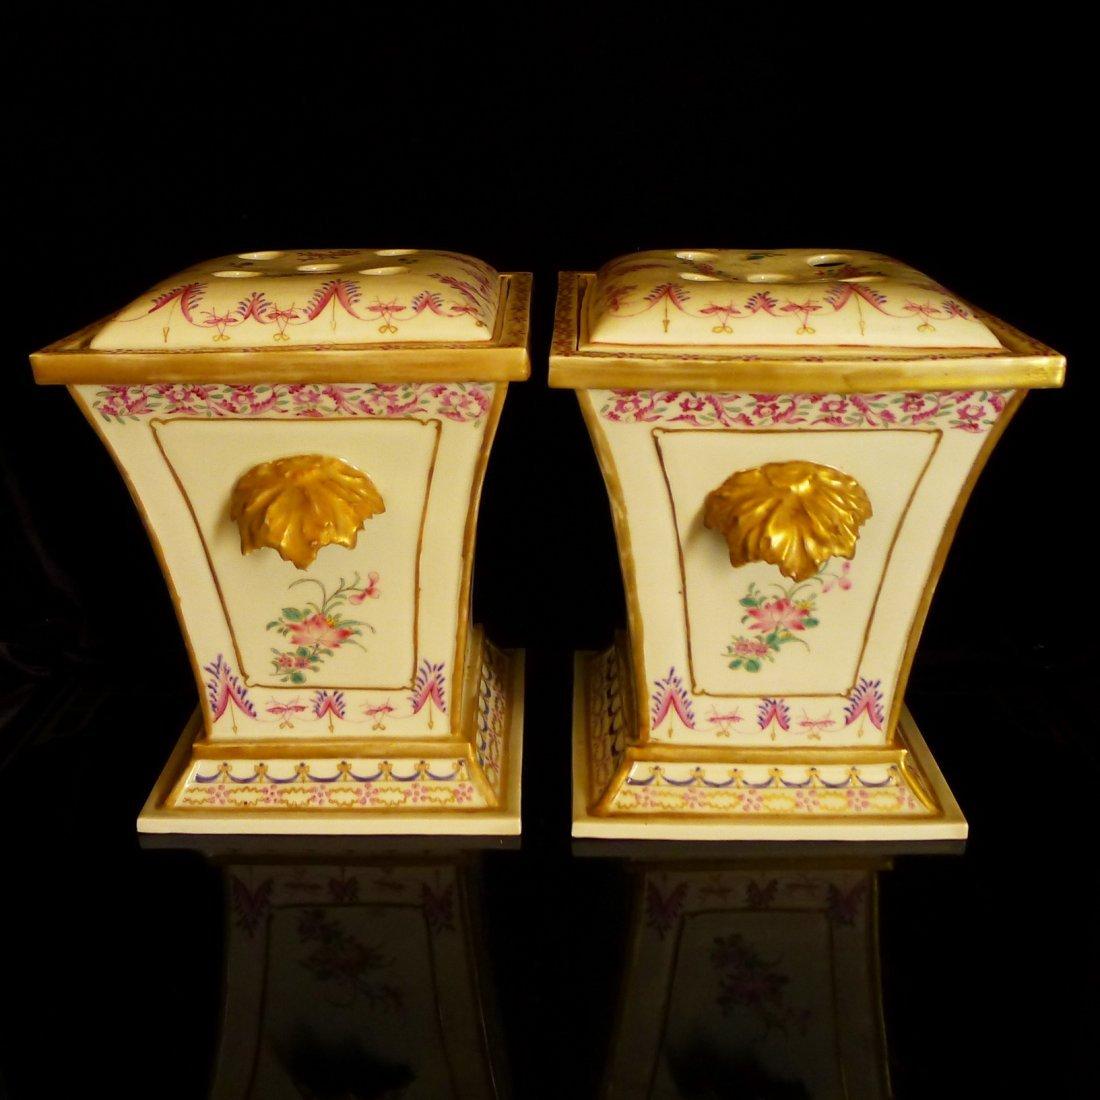 Prar of Chinese export porcelain European heraldry - 3